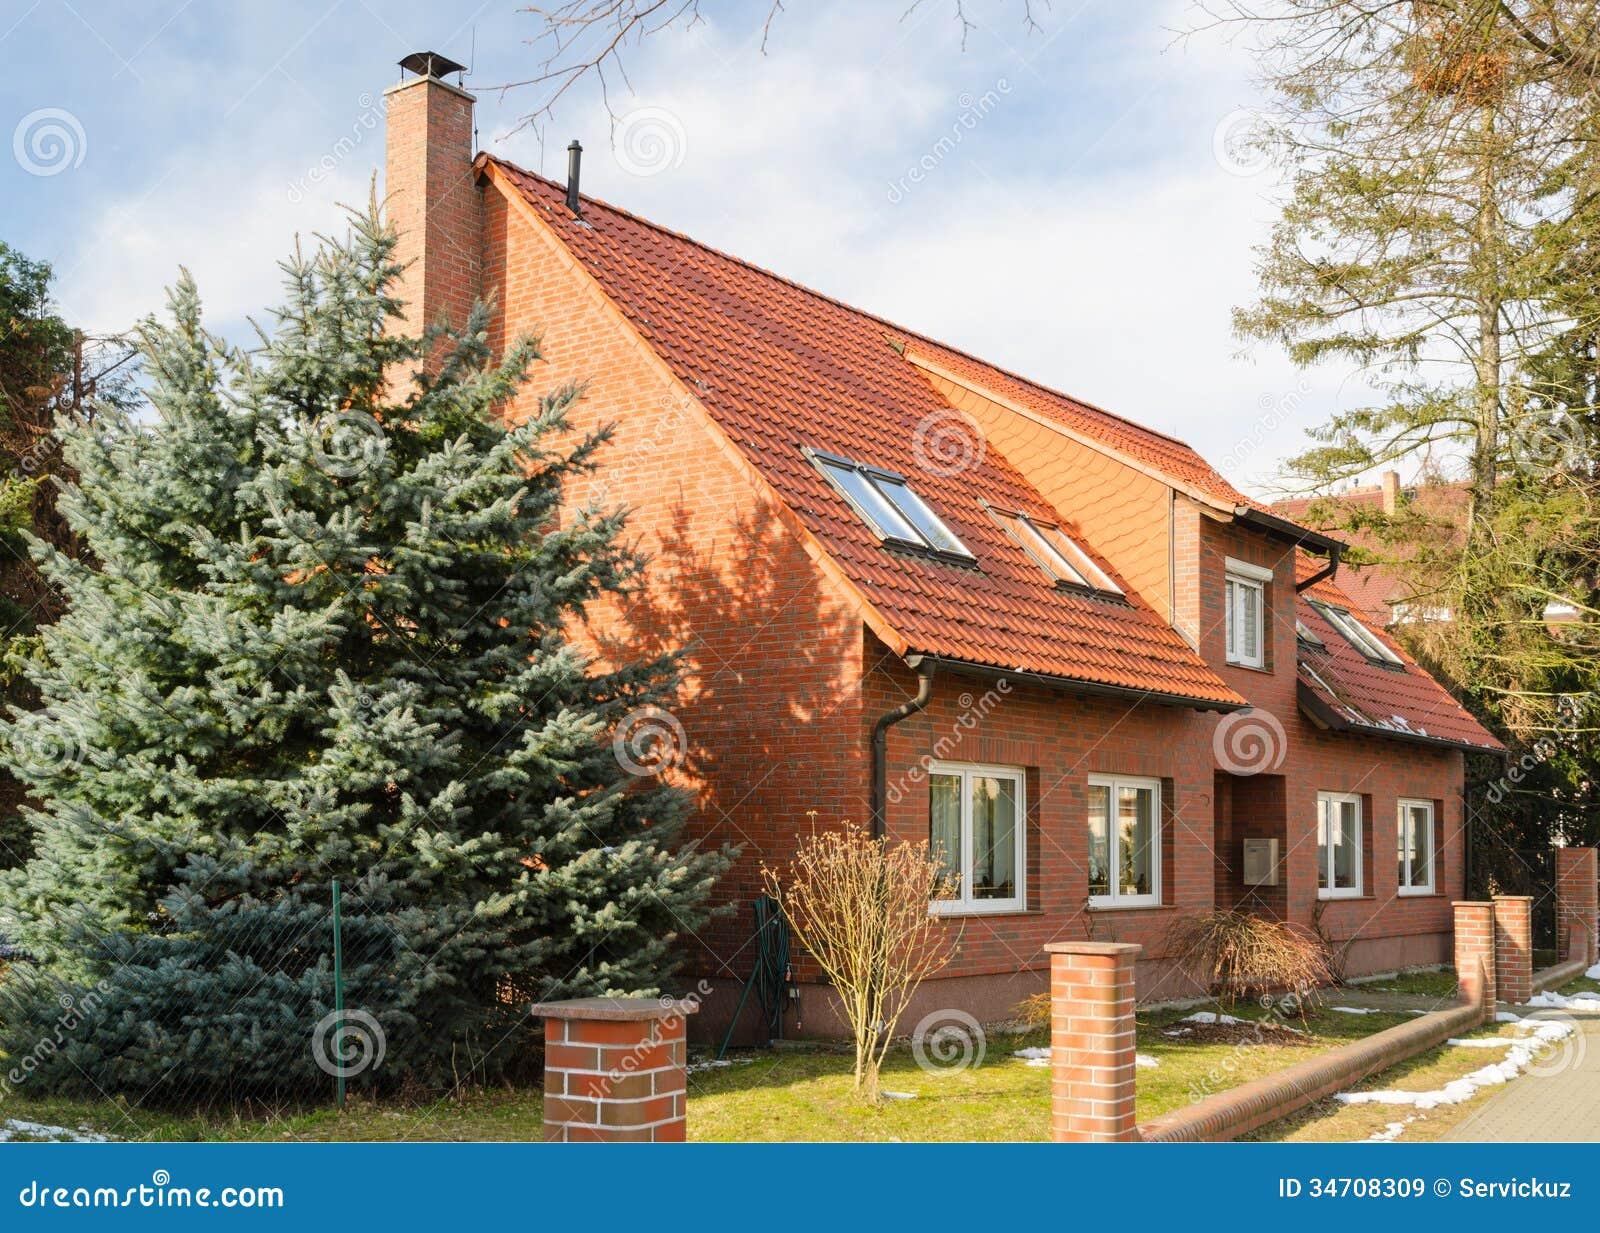 Traditional suburban european house royalty free stock for Europeanhome com